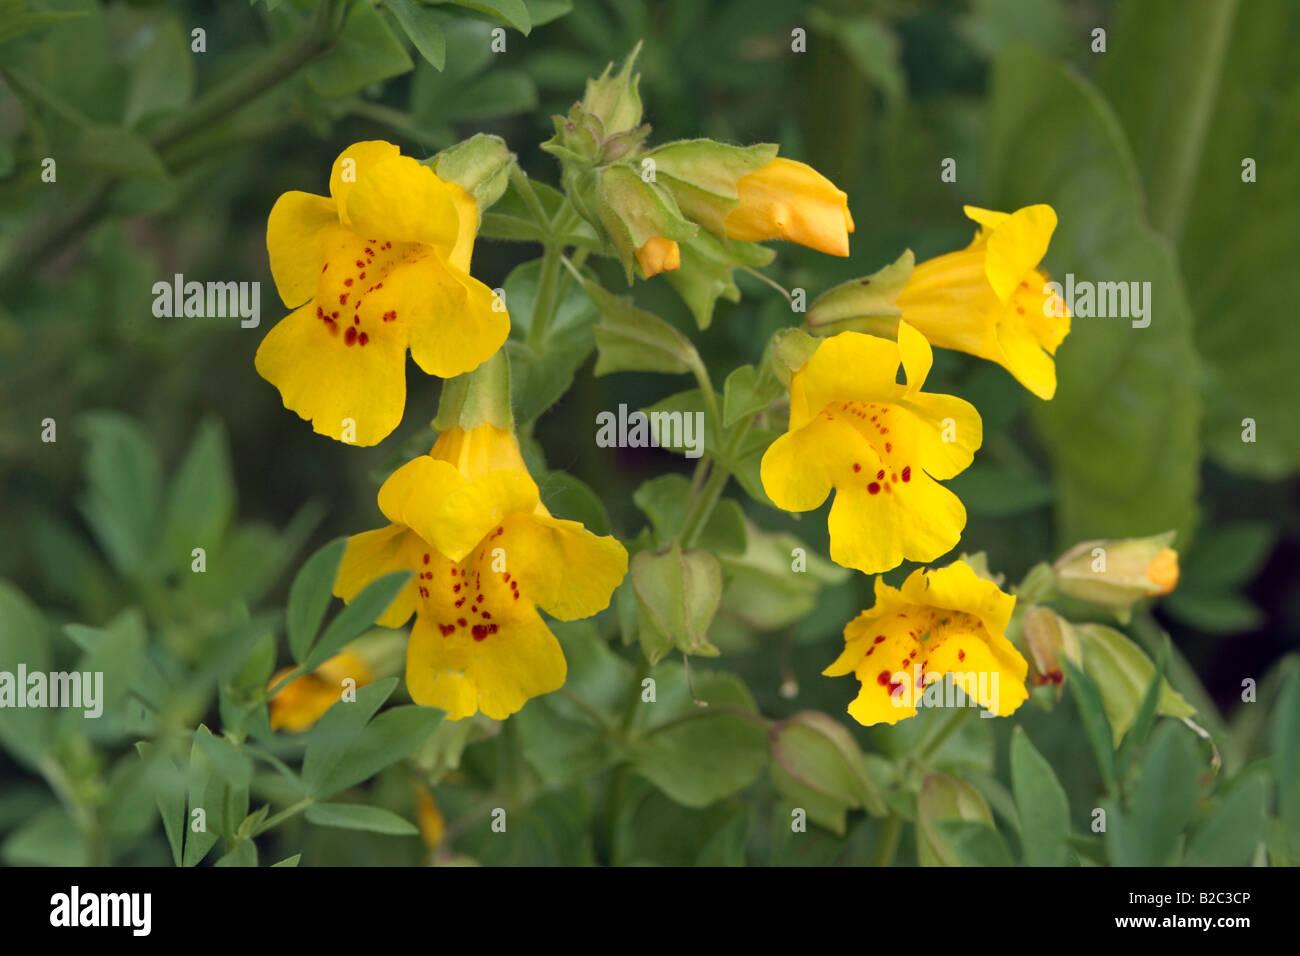 Allegheny monkey flower mimulus ringens yellow flowers stock allegheny monkey flower mimulus ringens yellow flowers mightylinksfo